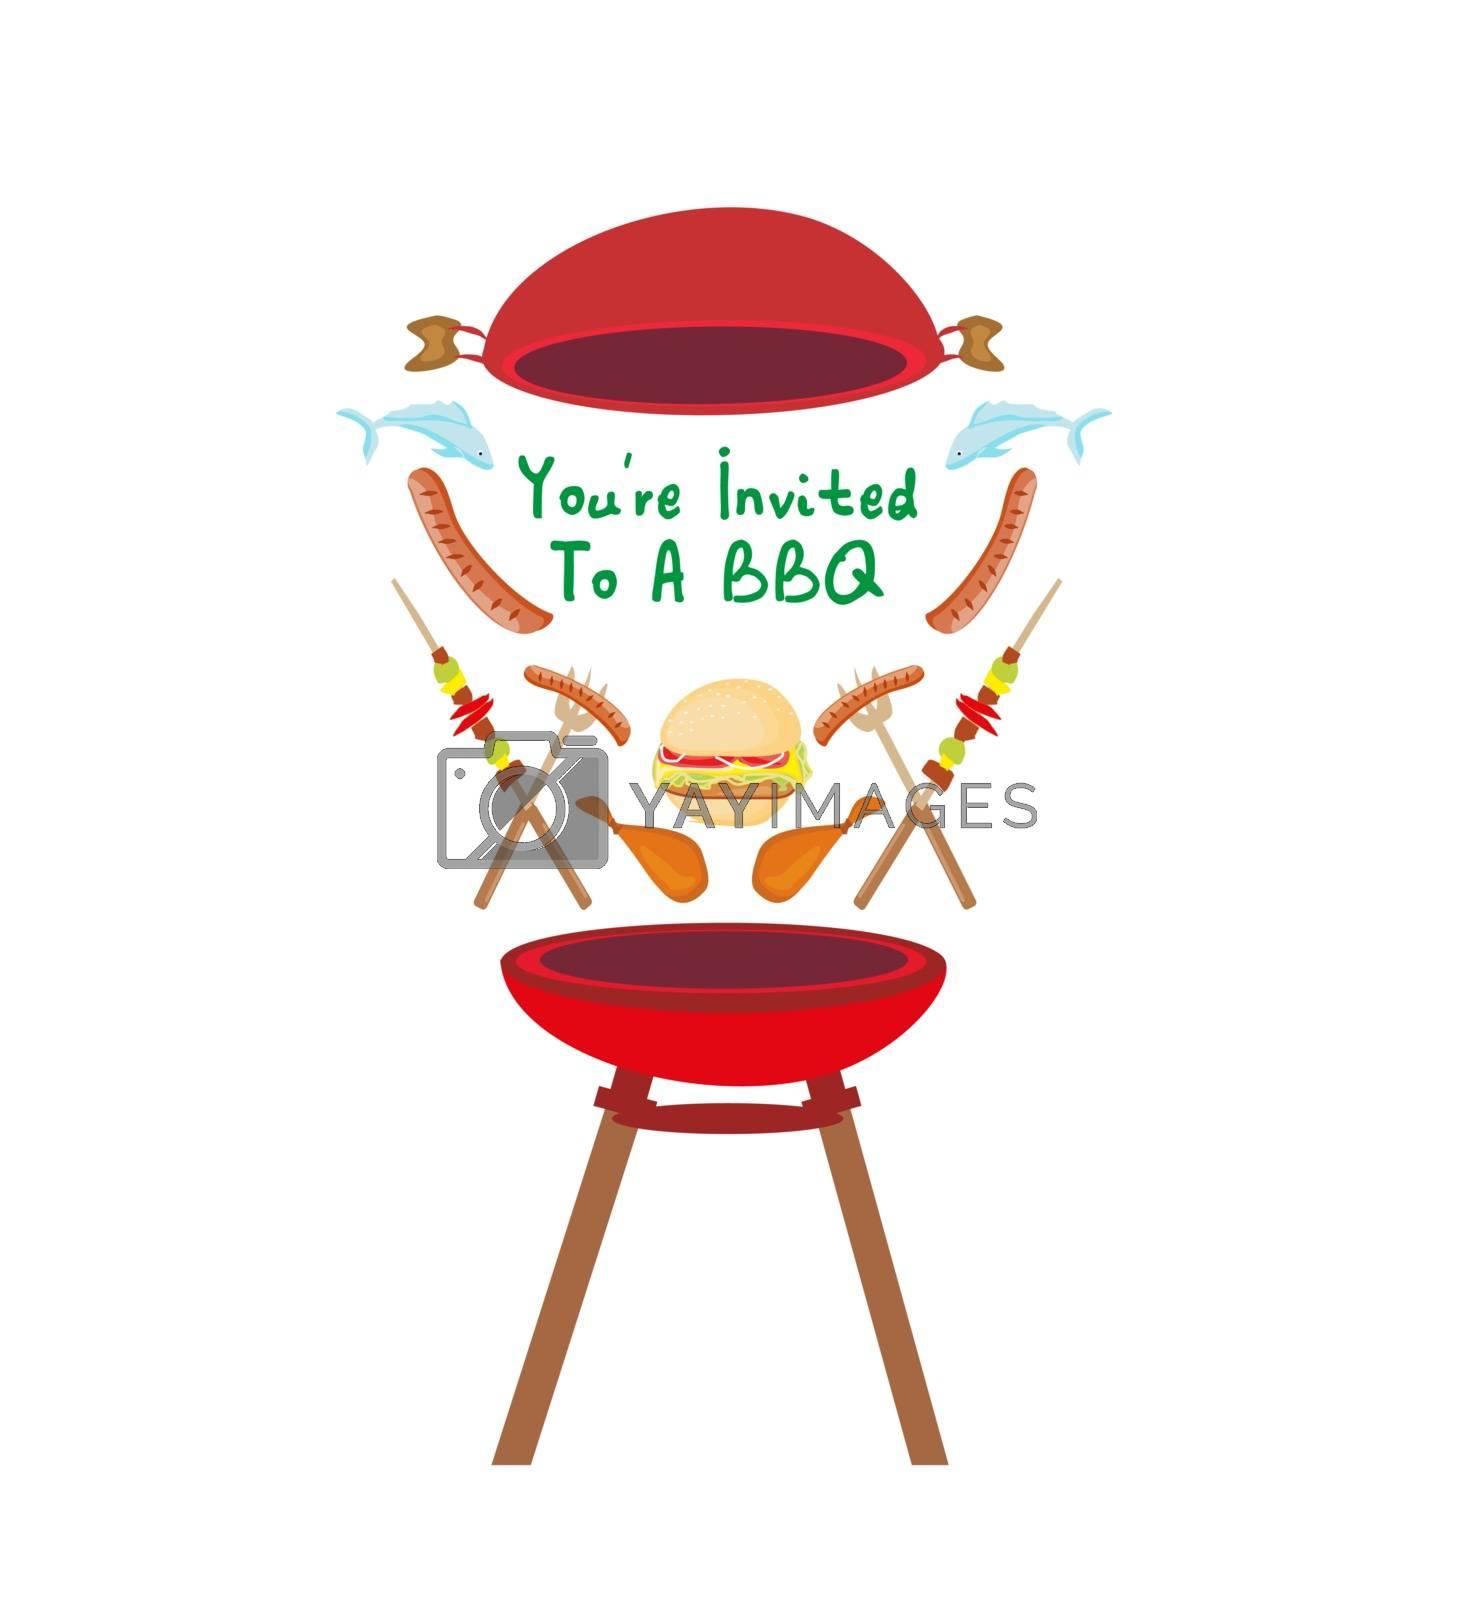 Barbecue Party Invitation banner